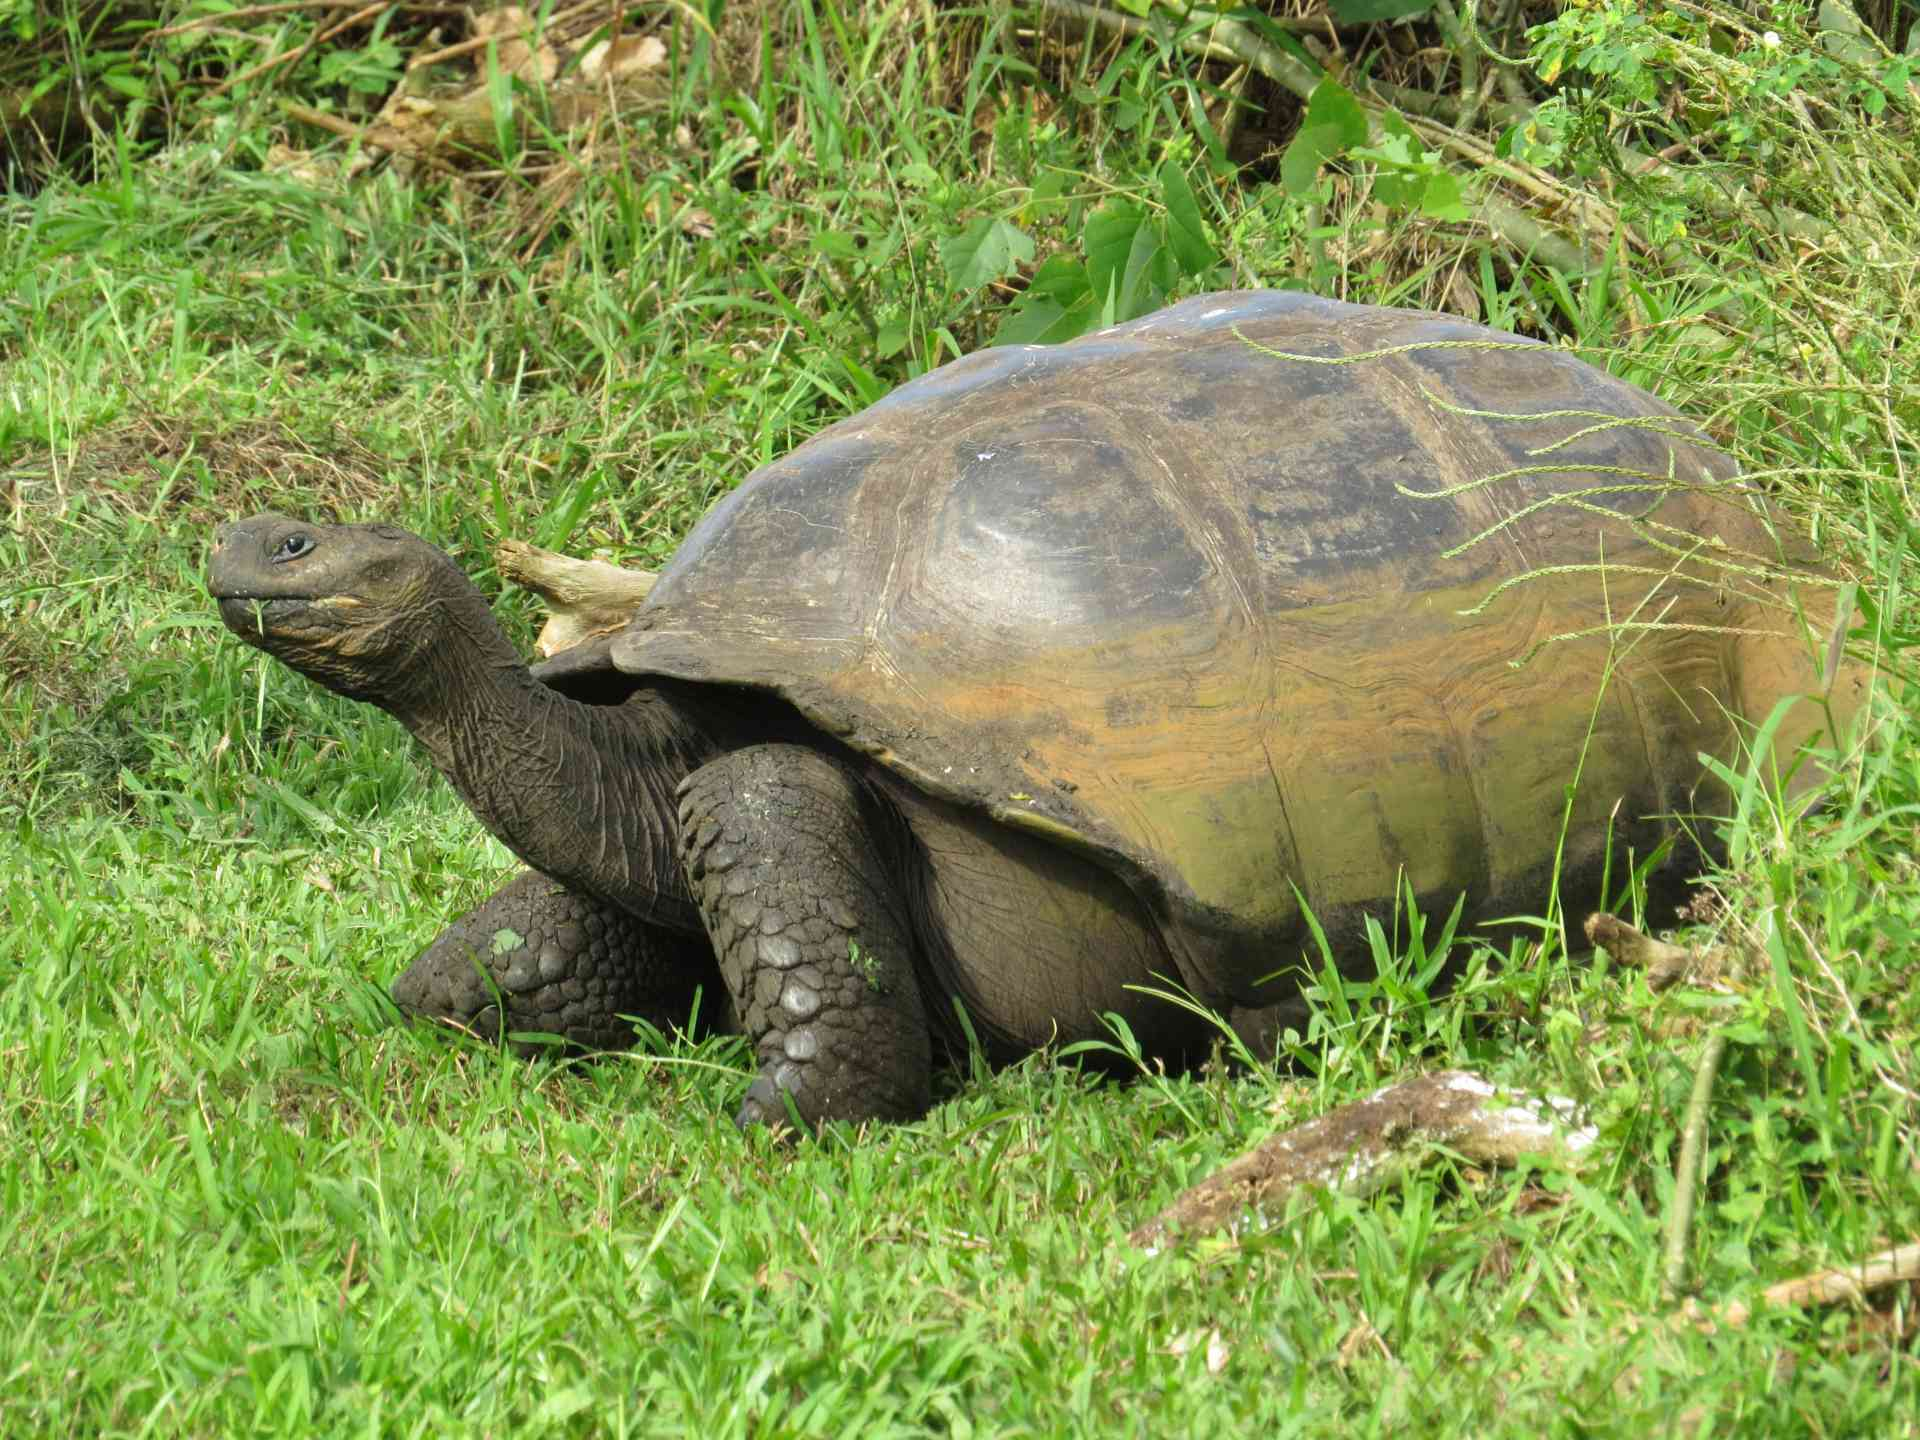 Galapagos Tortoise, Ecuador by Marion Bunnik